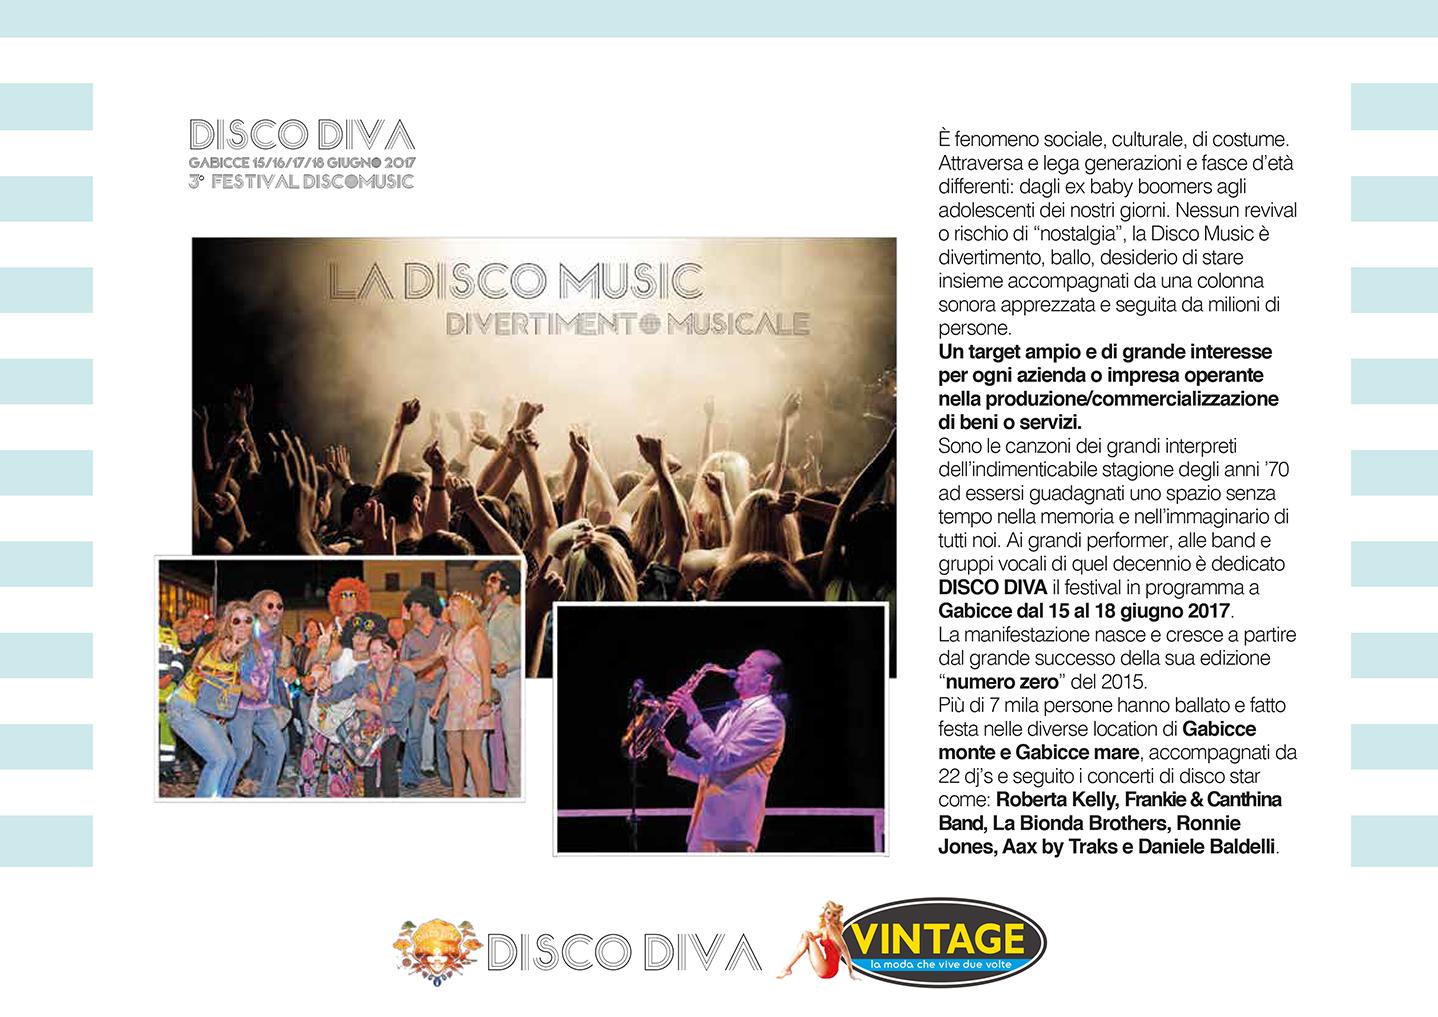 VINTAGE_discodiva-4